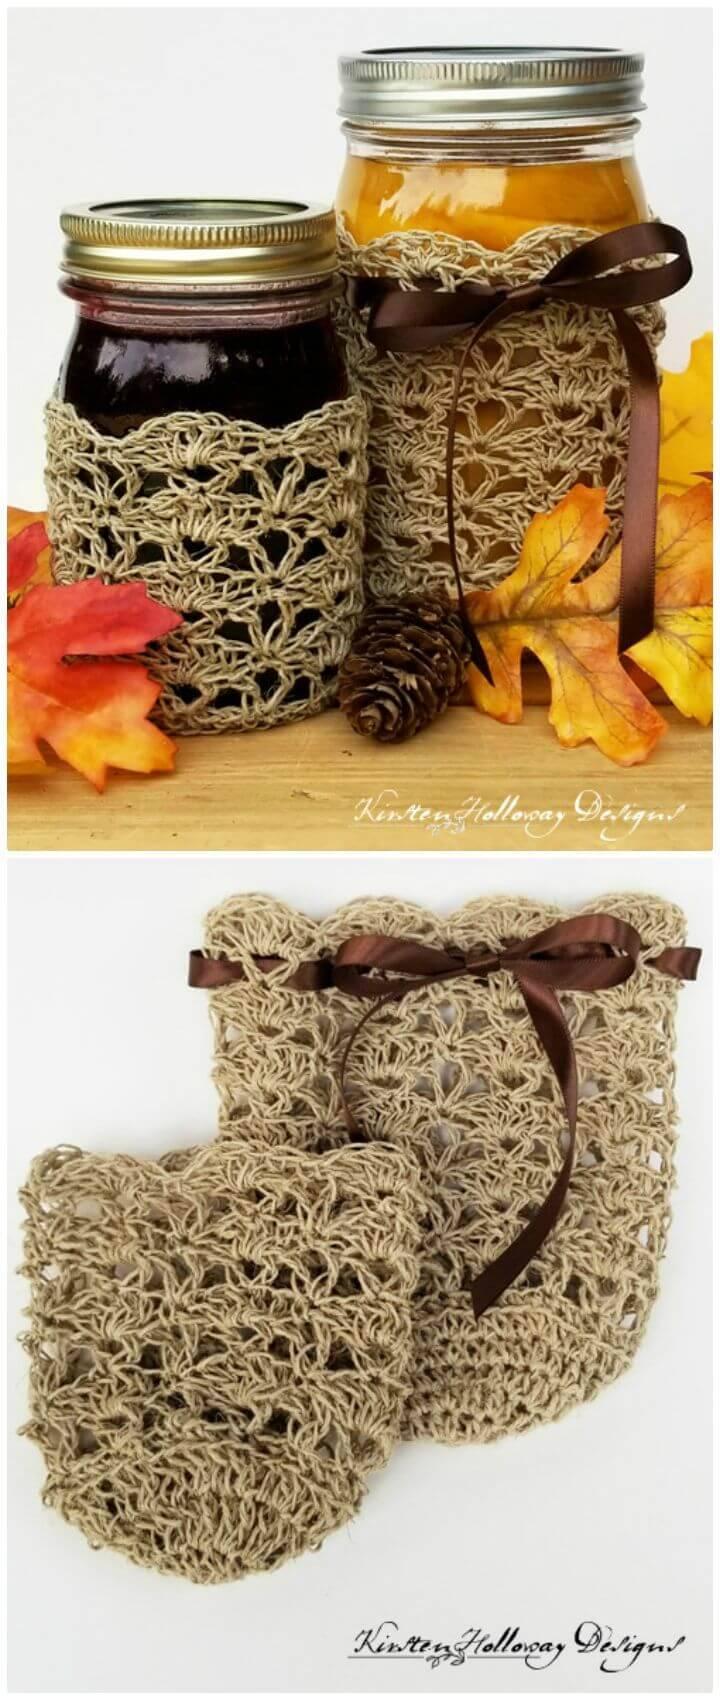 Easy Crocheted Rustic Elegance Canning Jar Cozy Set - Free Pattern